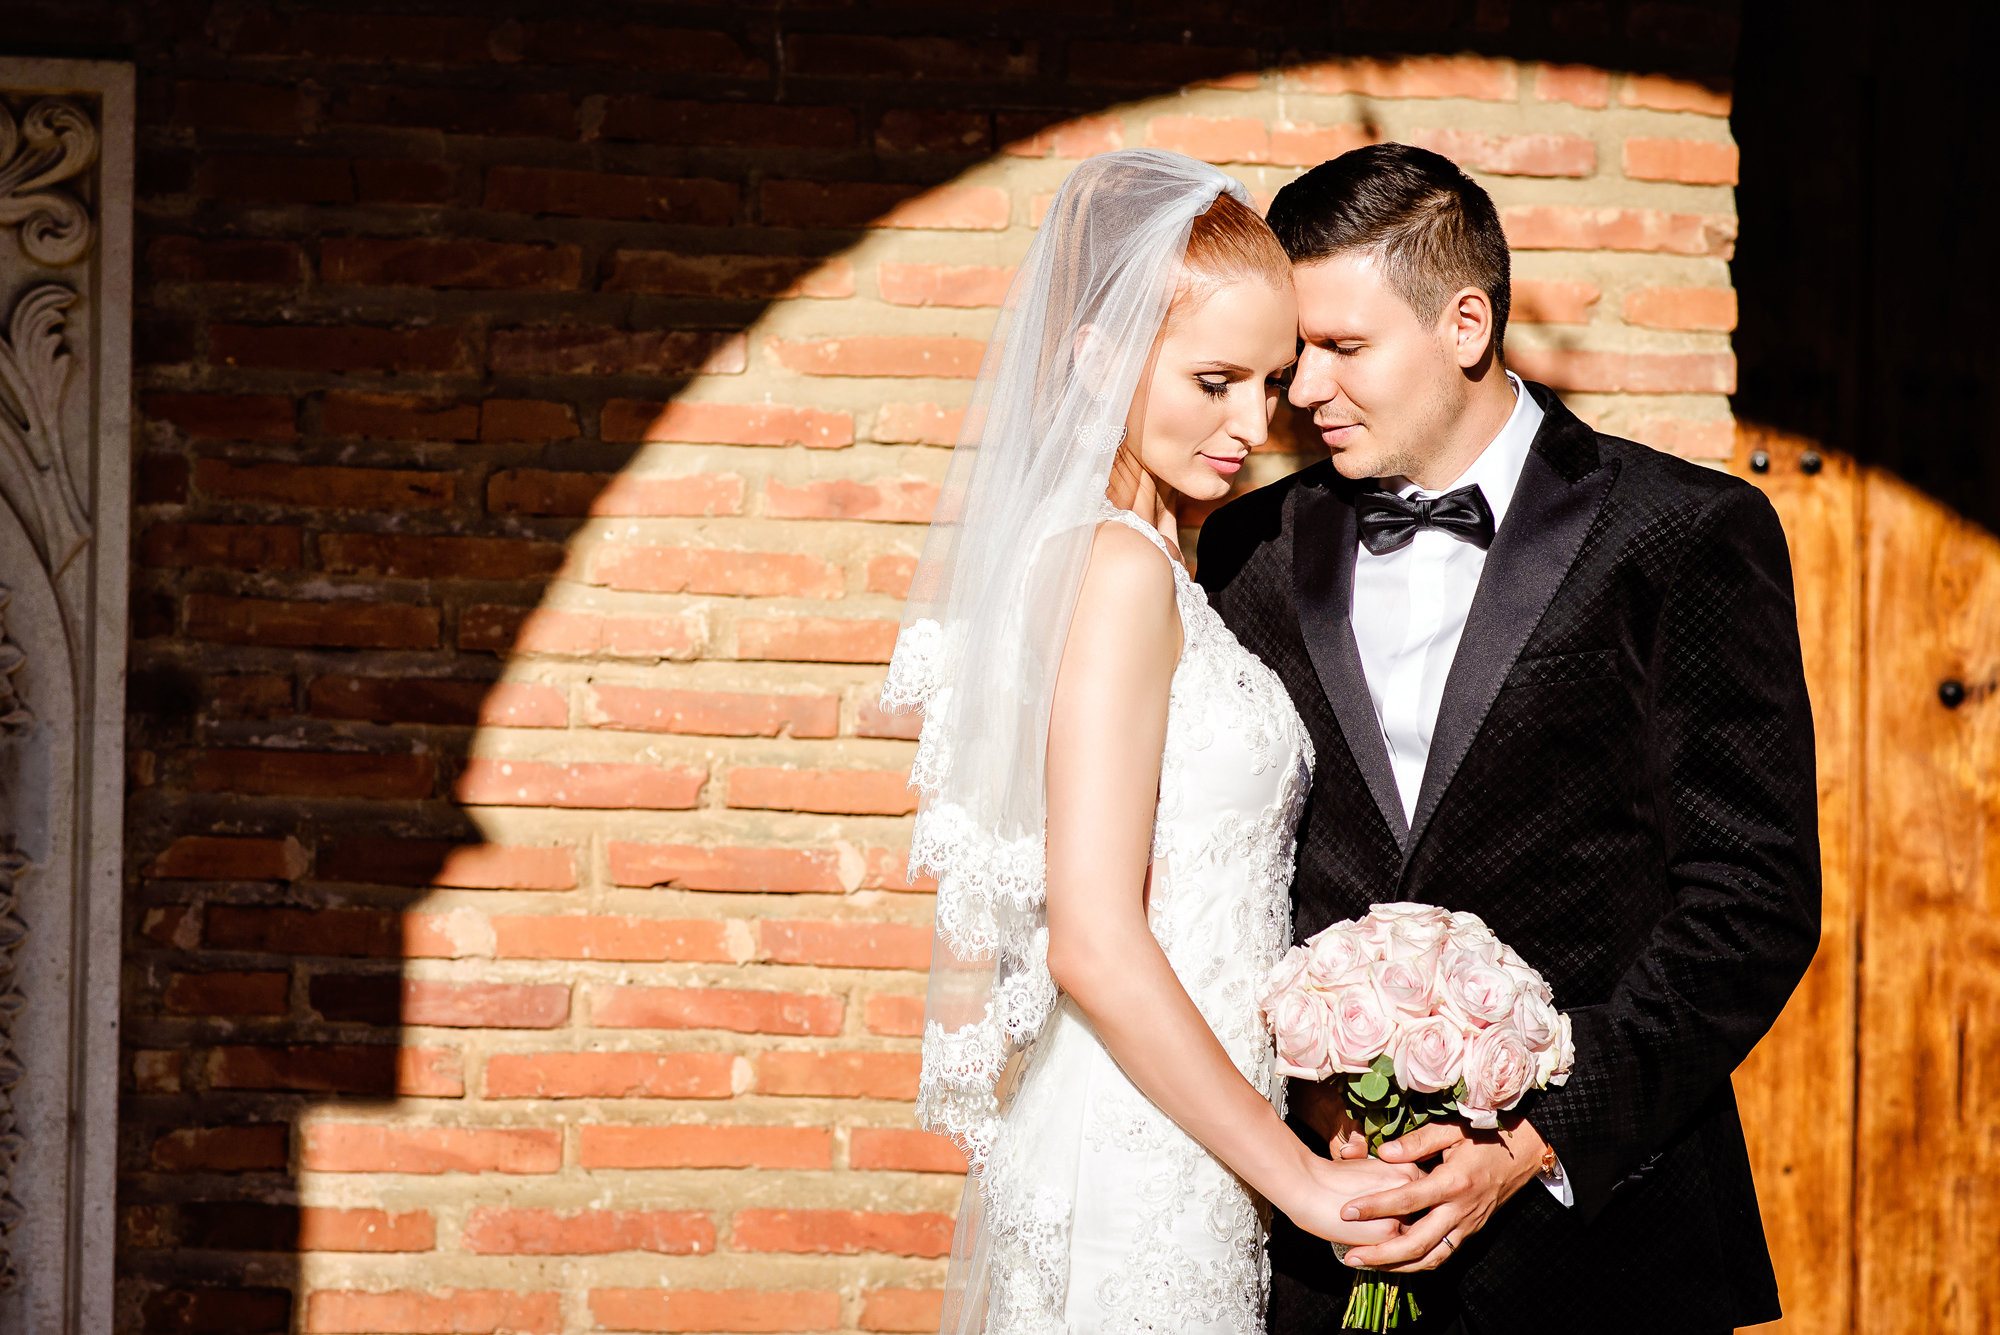 alexandru madalina wedding day 22